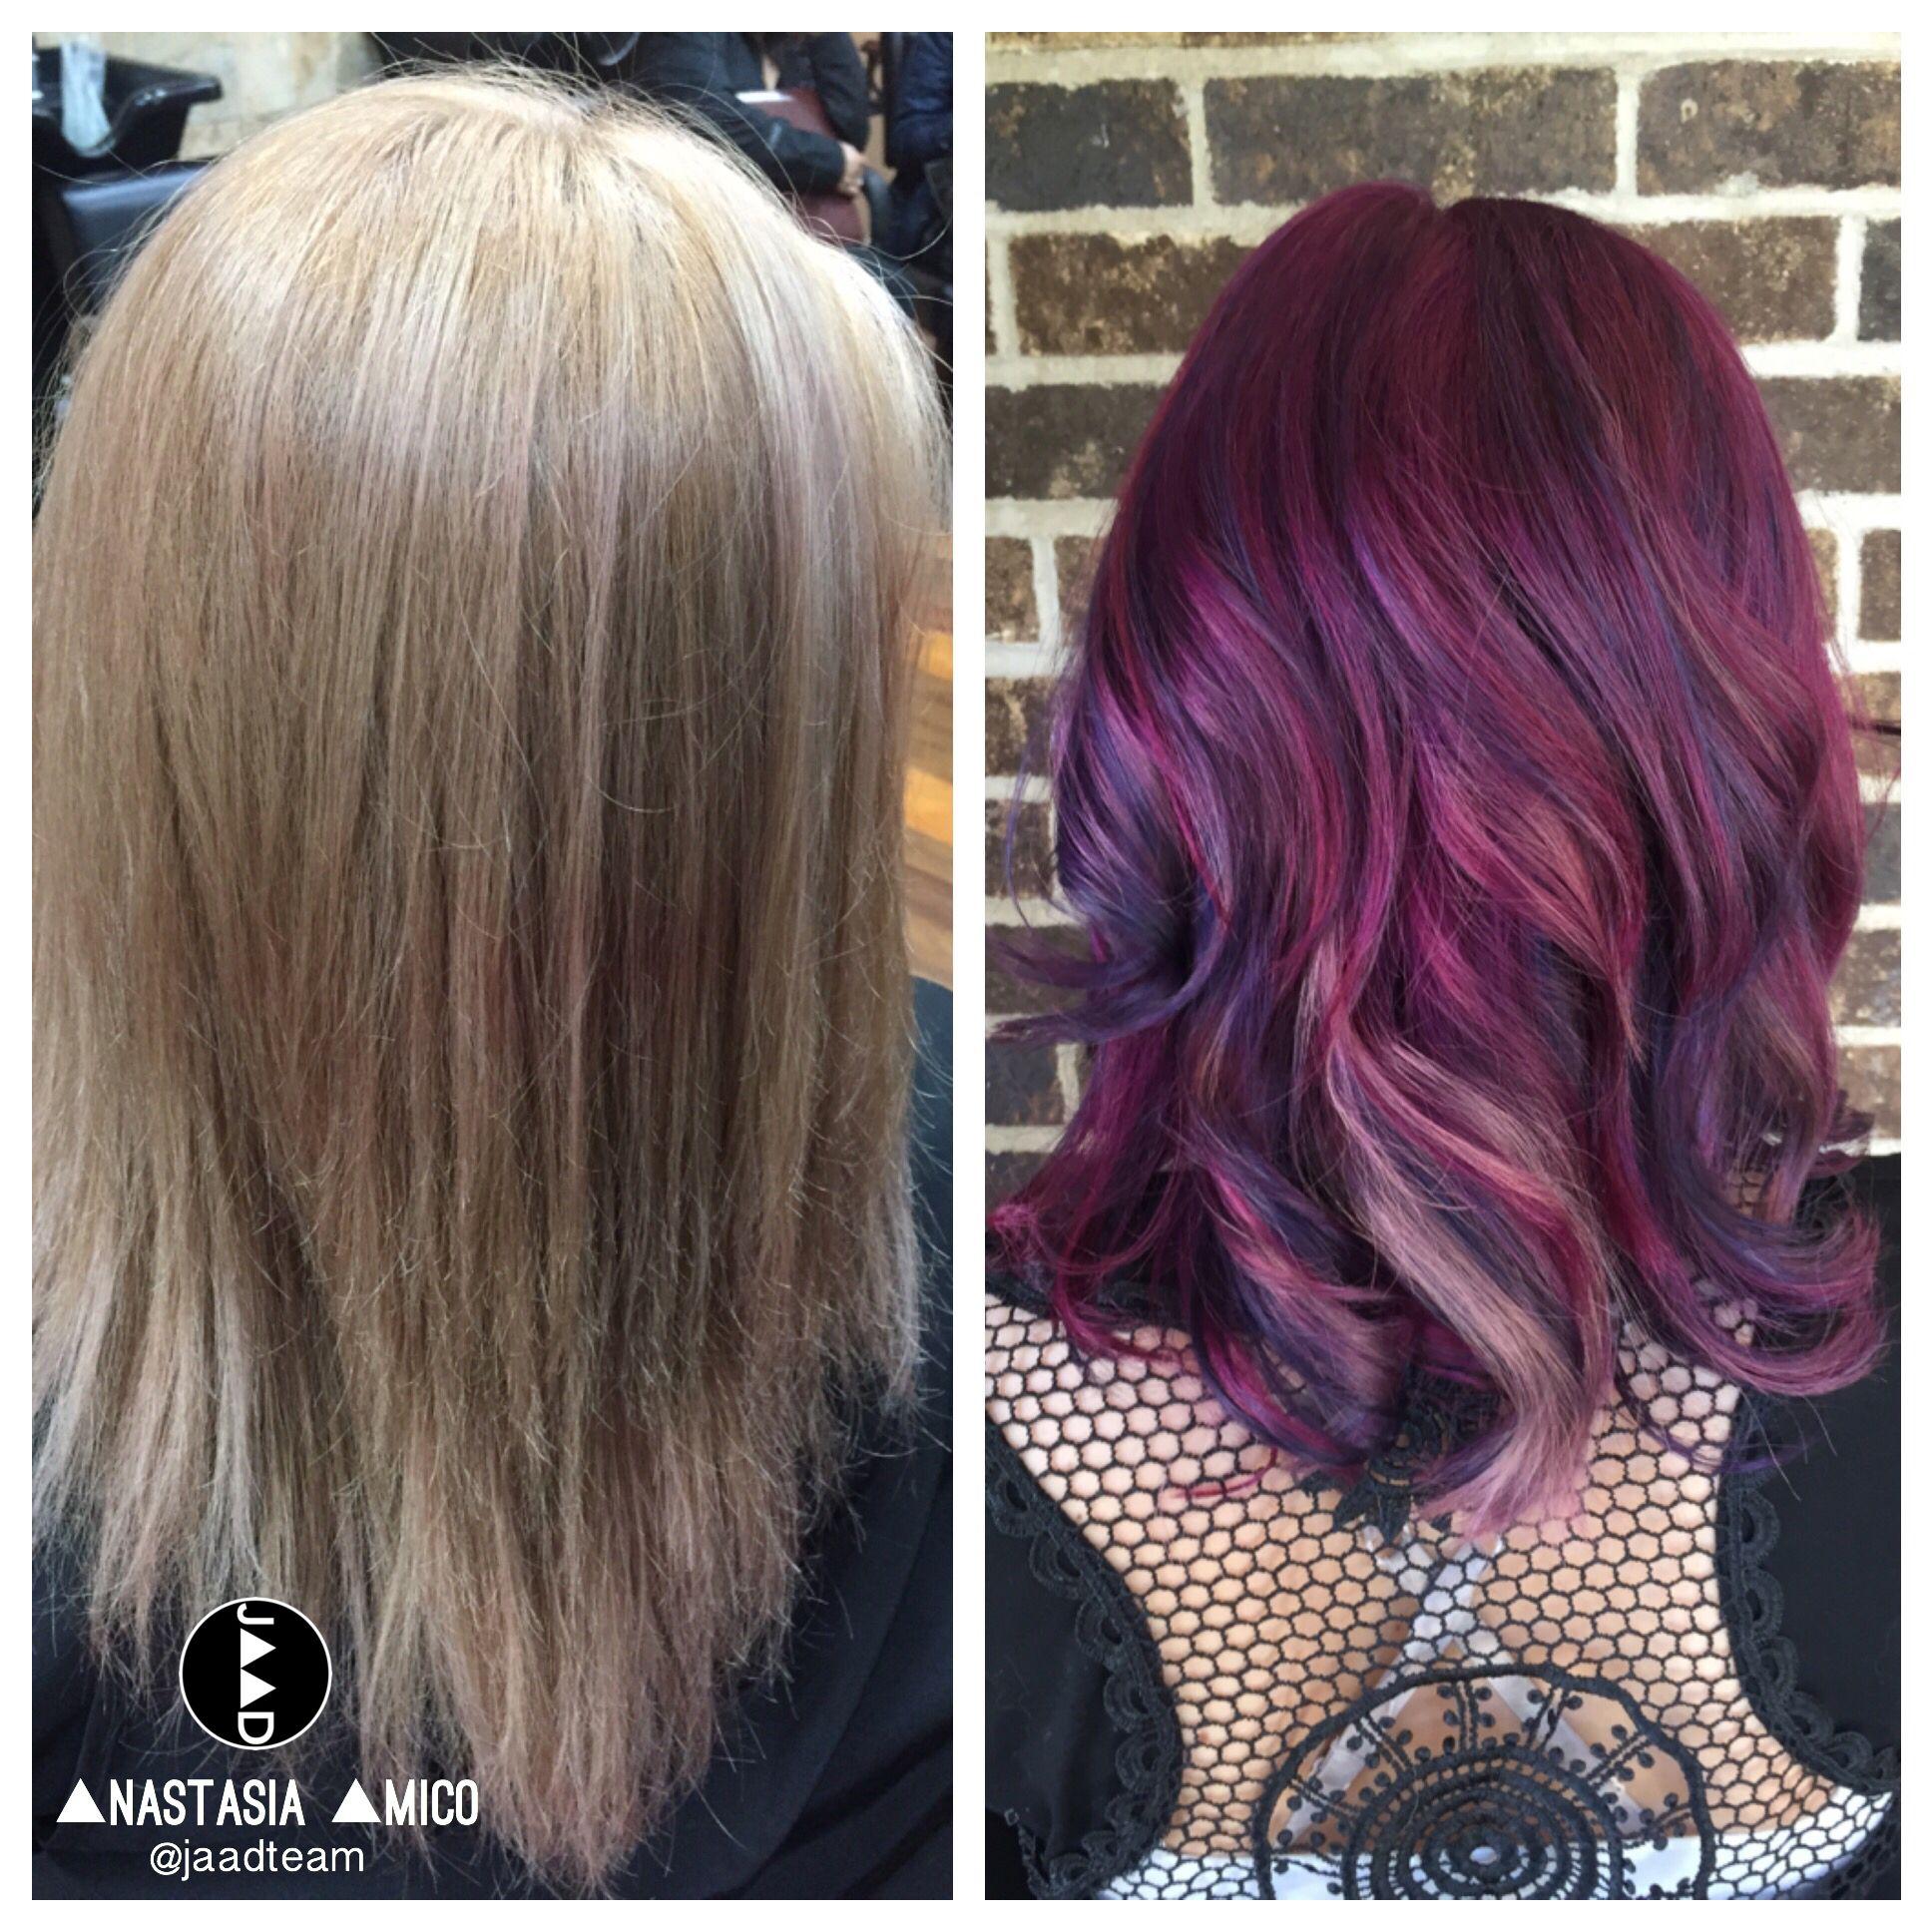 formula blueberrygrape color swirl hair and makeup